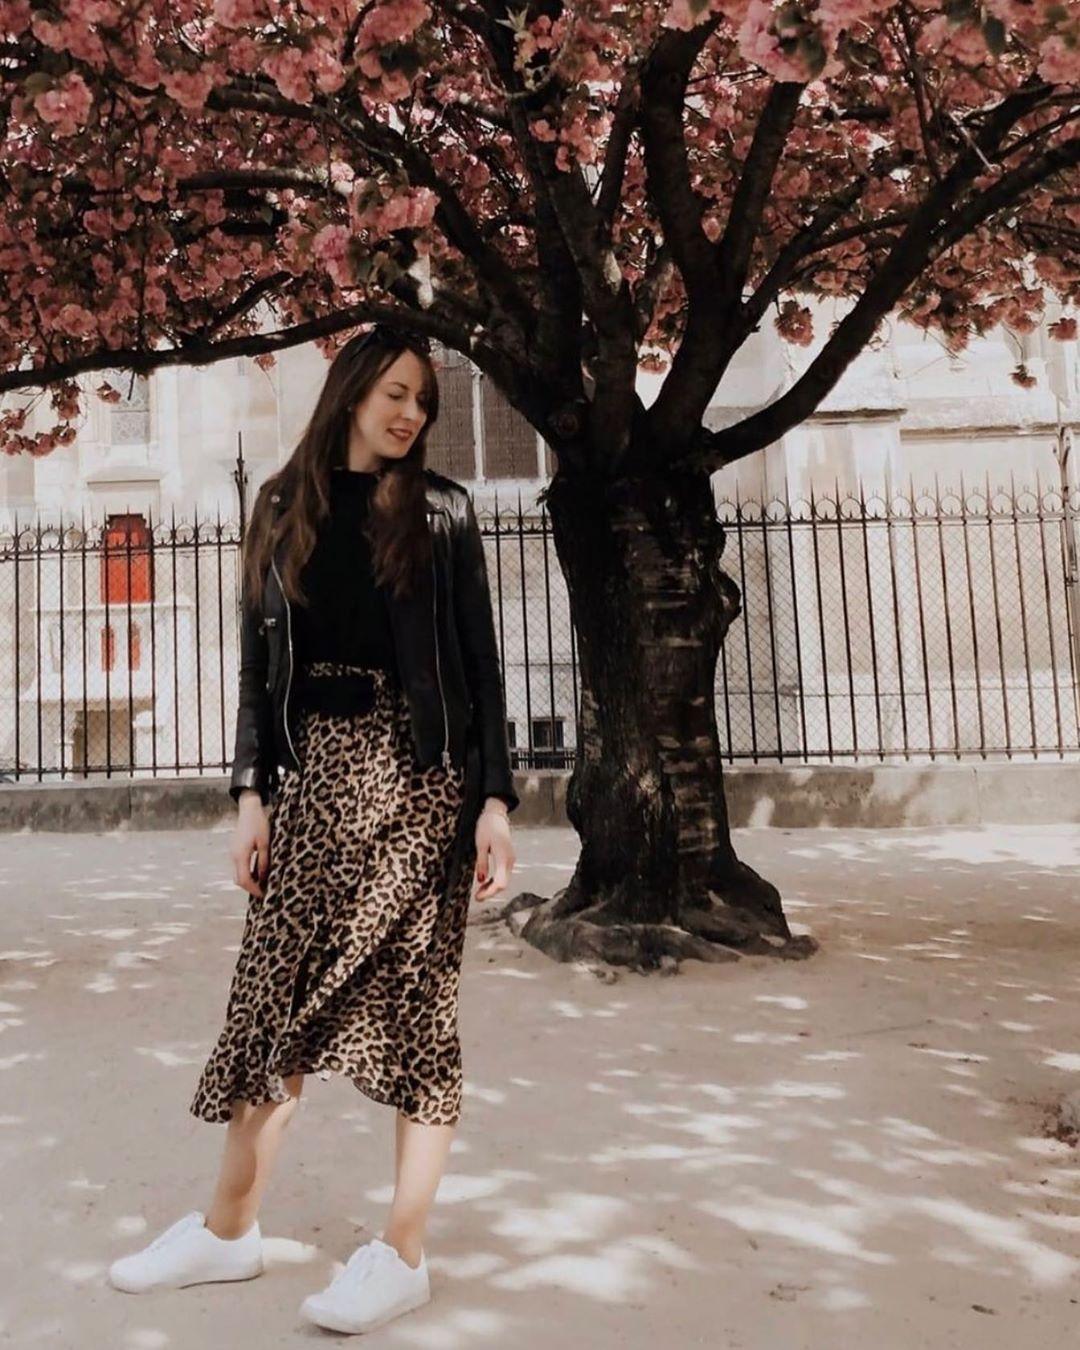 jupe satinée et imprimée de Zara sur zara_streets